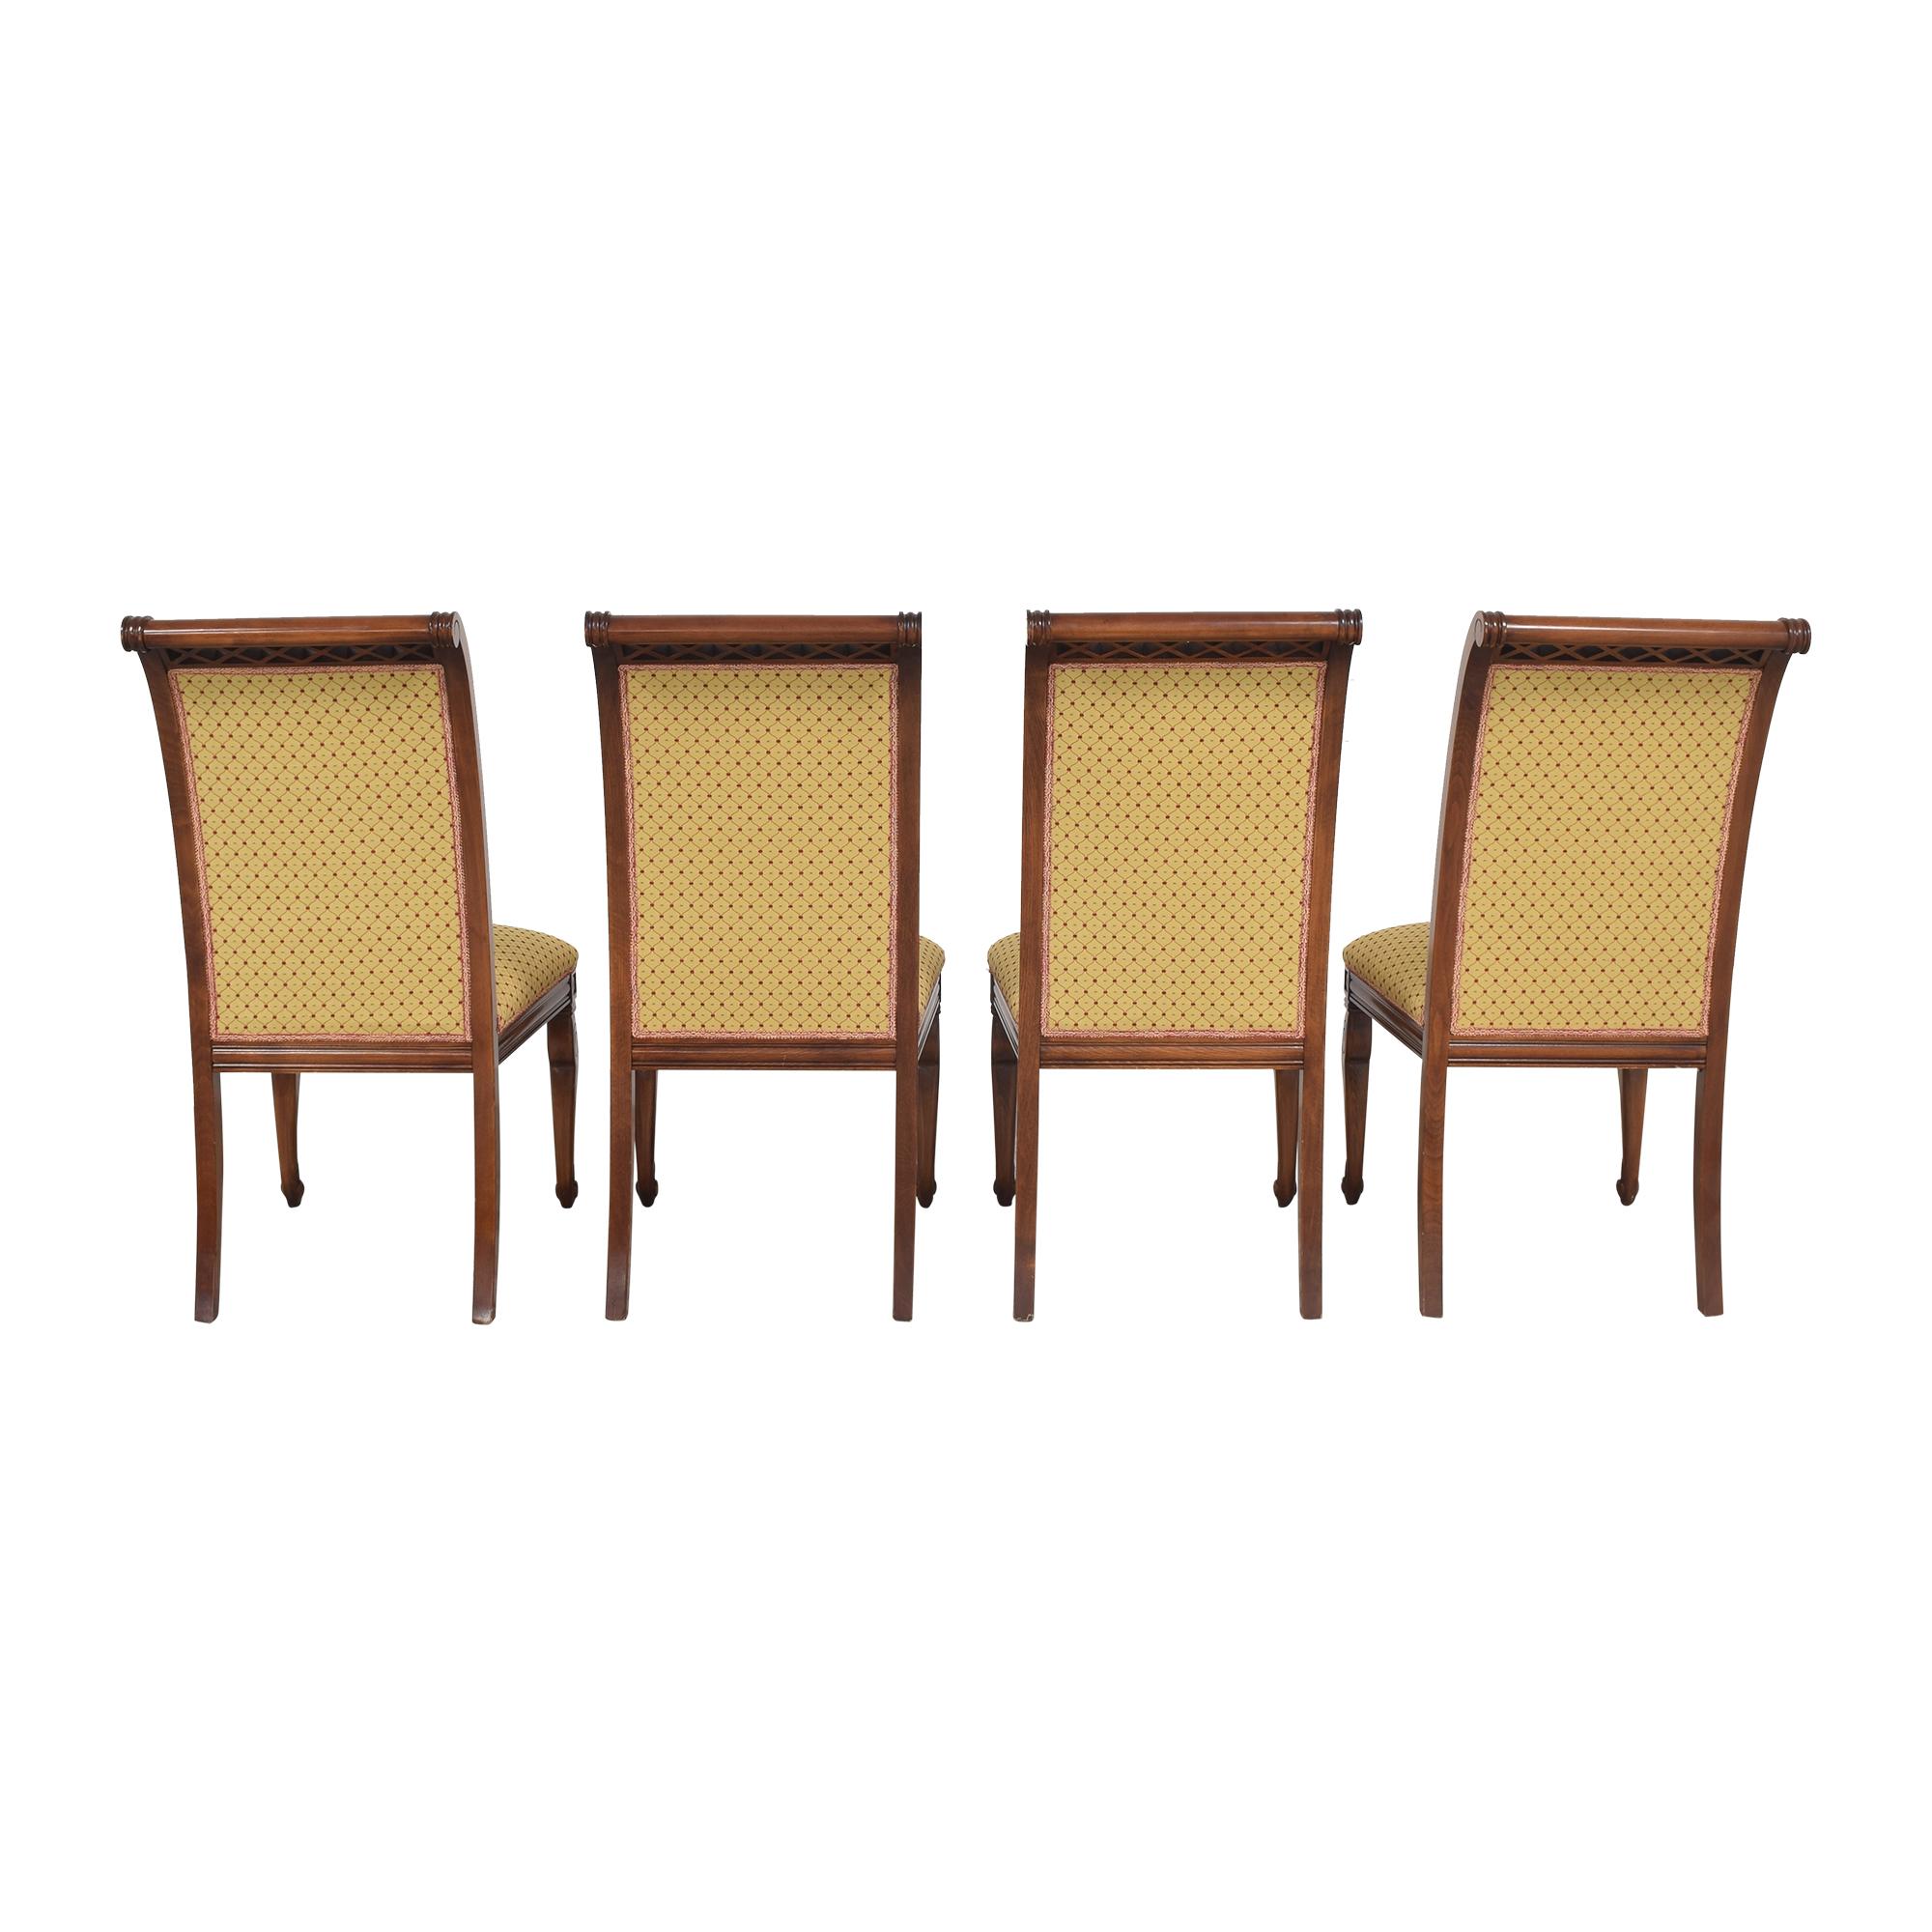 buy KPS Furnishings Custom Dining Chairs KPS Furnishings Dining Chairs